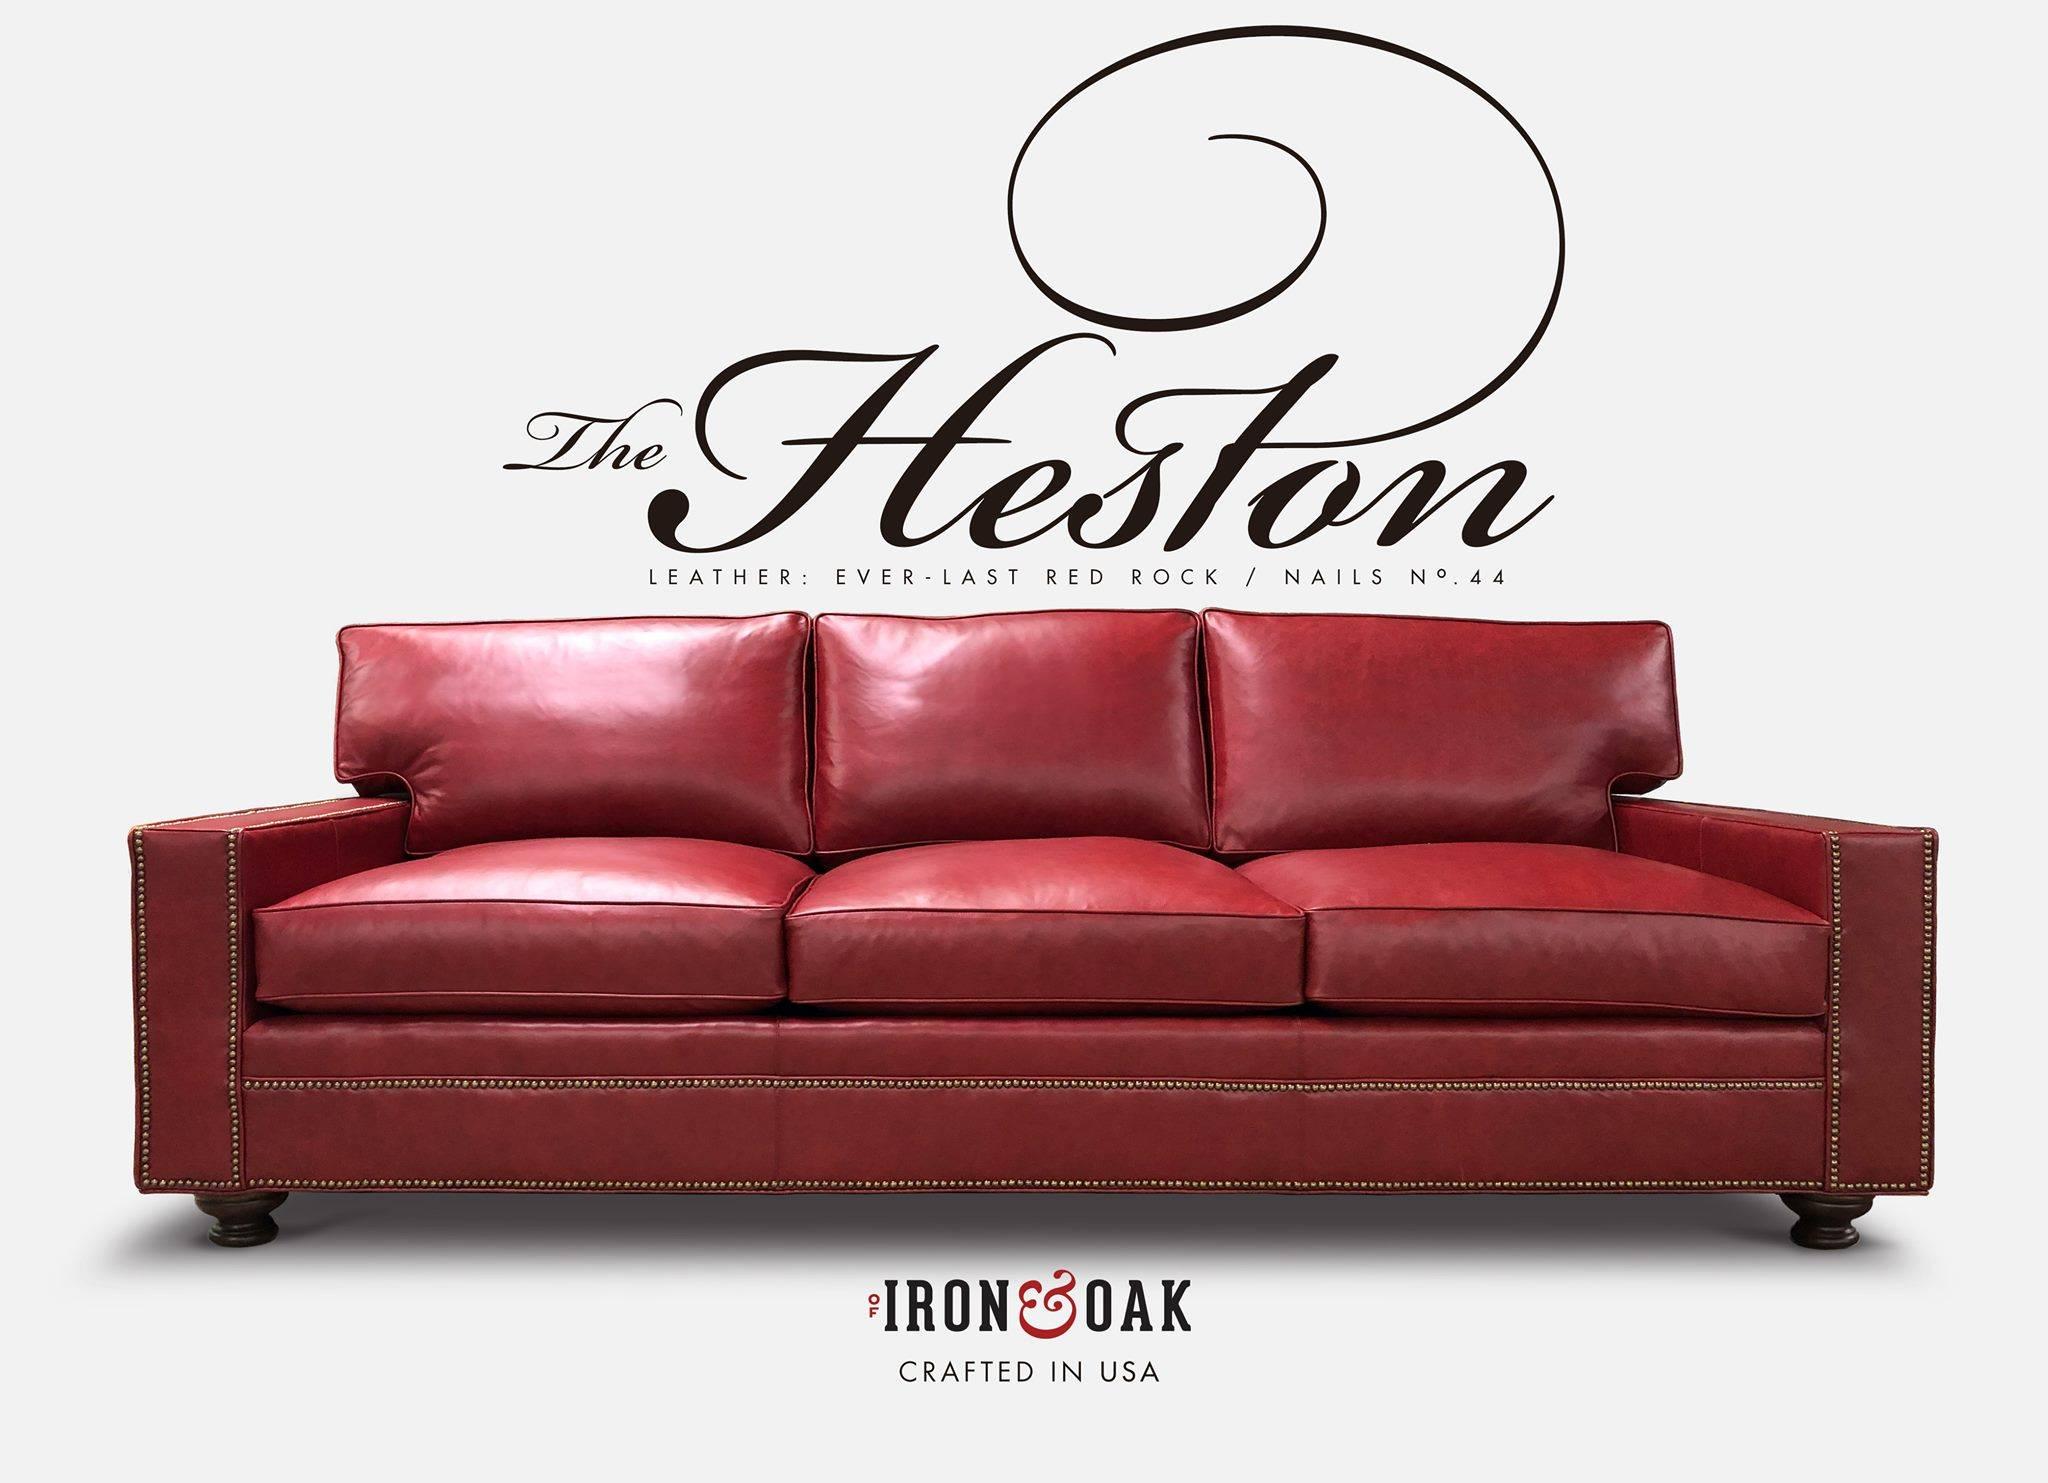 Heston Leather Sofa Everlast Red Rock